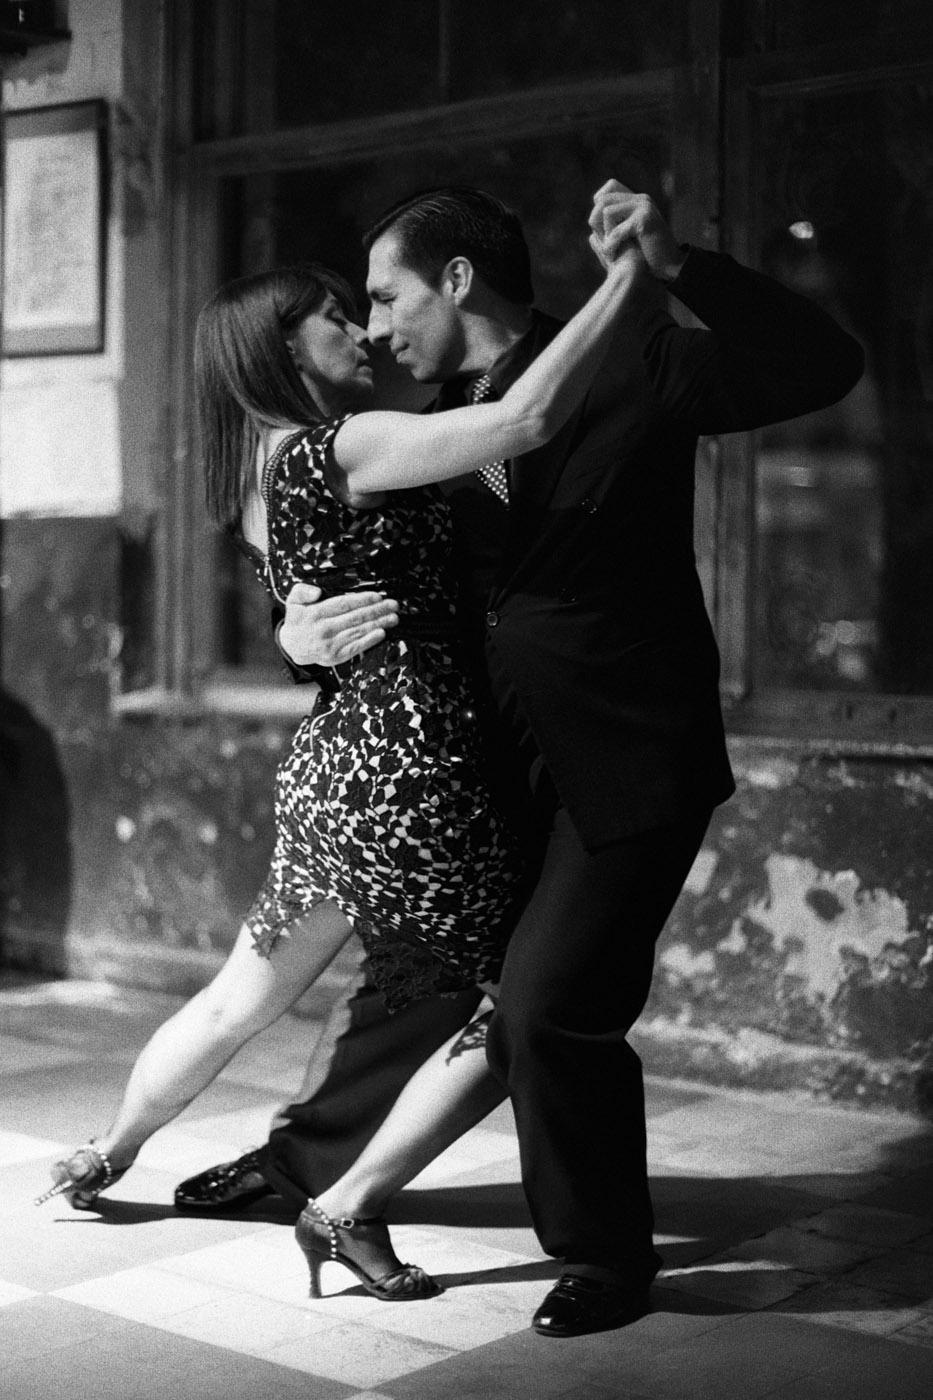 The postcard representation of tango